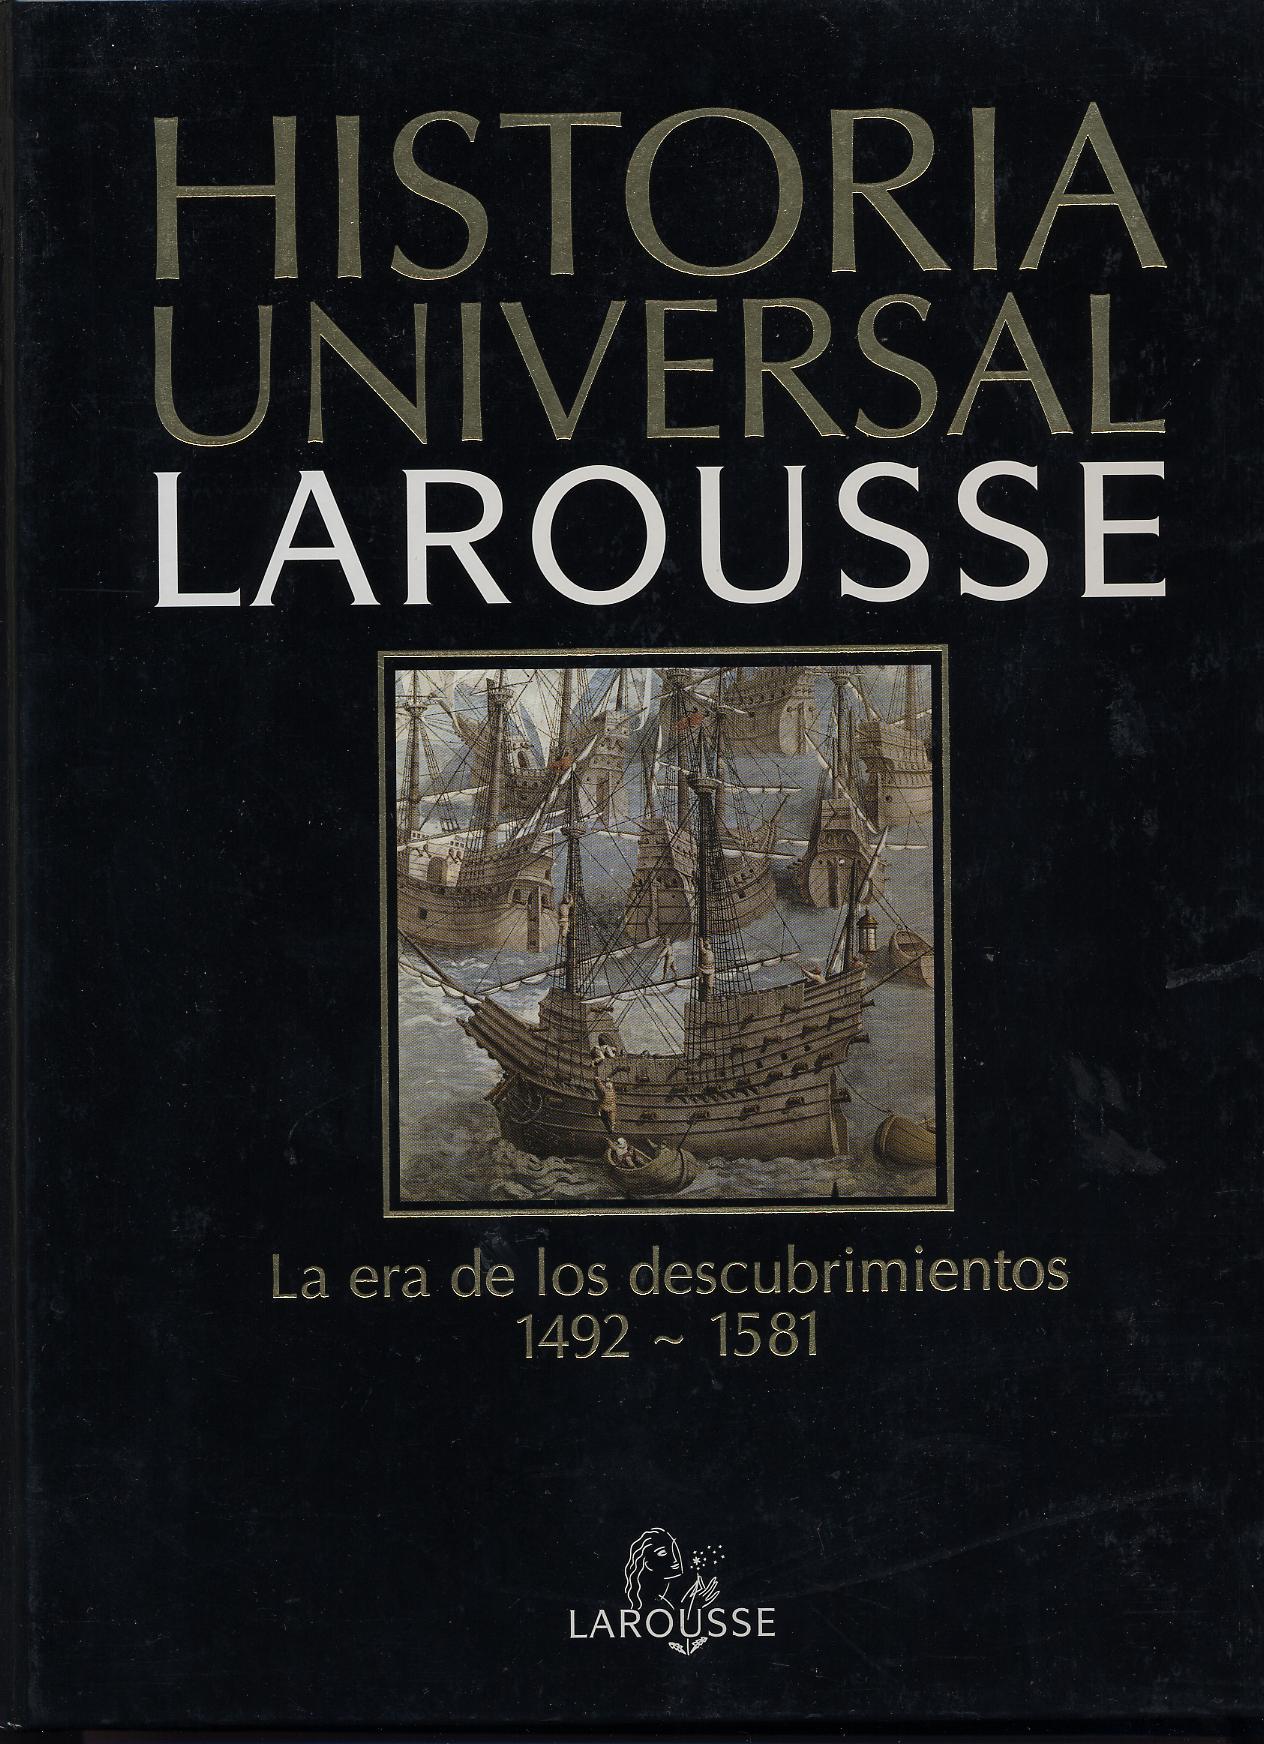 Historia Universal Larouse